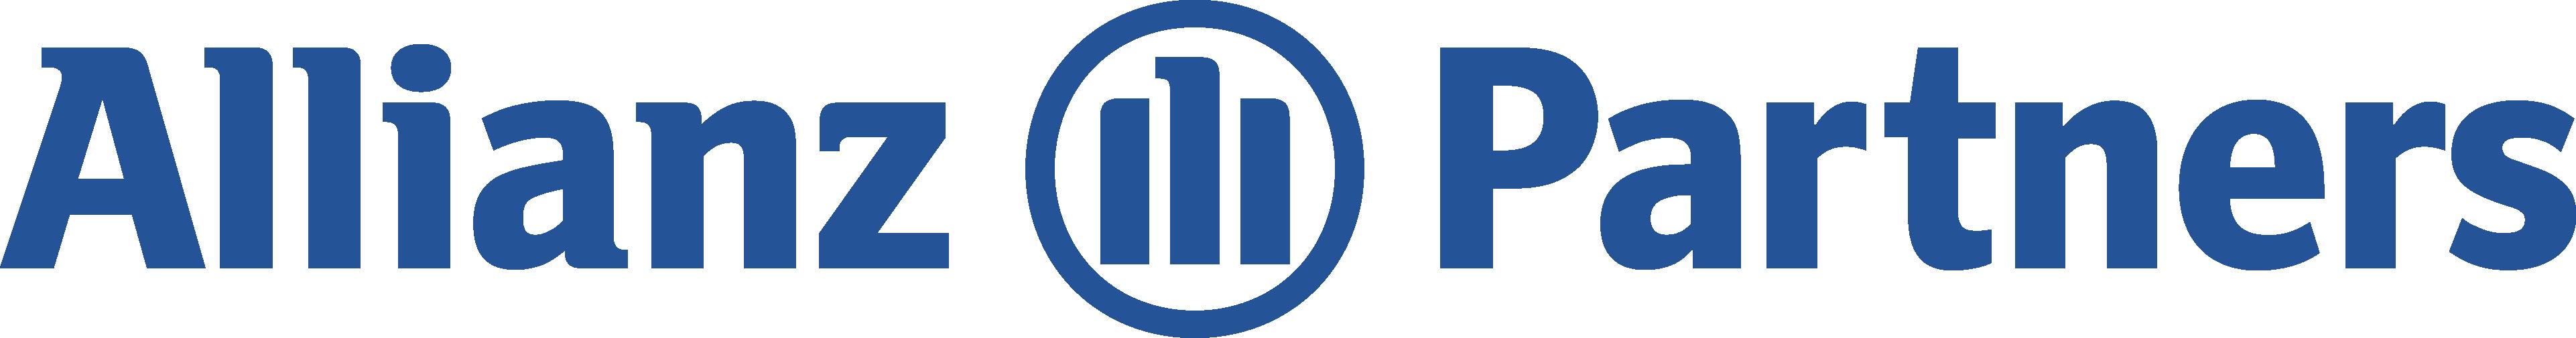 alt='Allianz Partners'  Title='Allianz Partners'